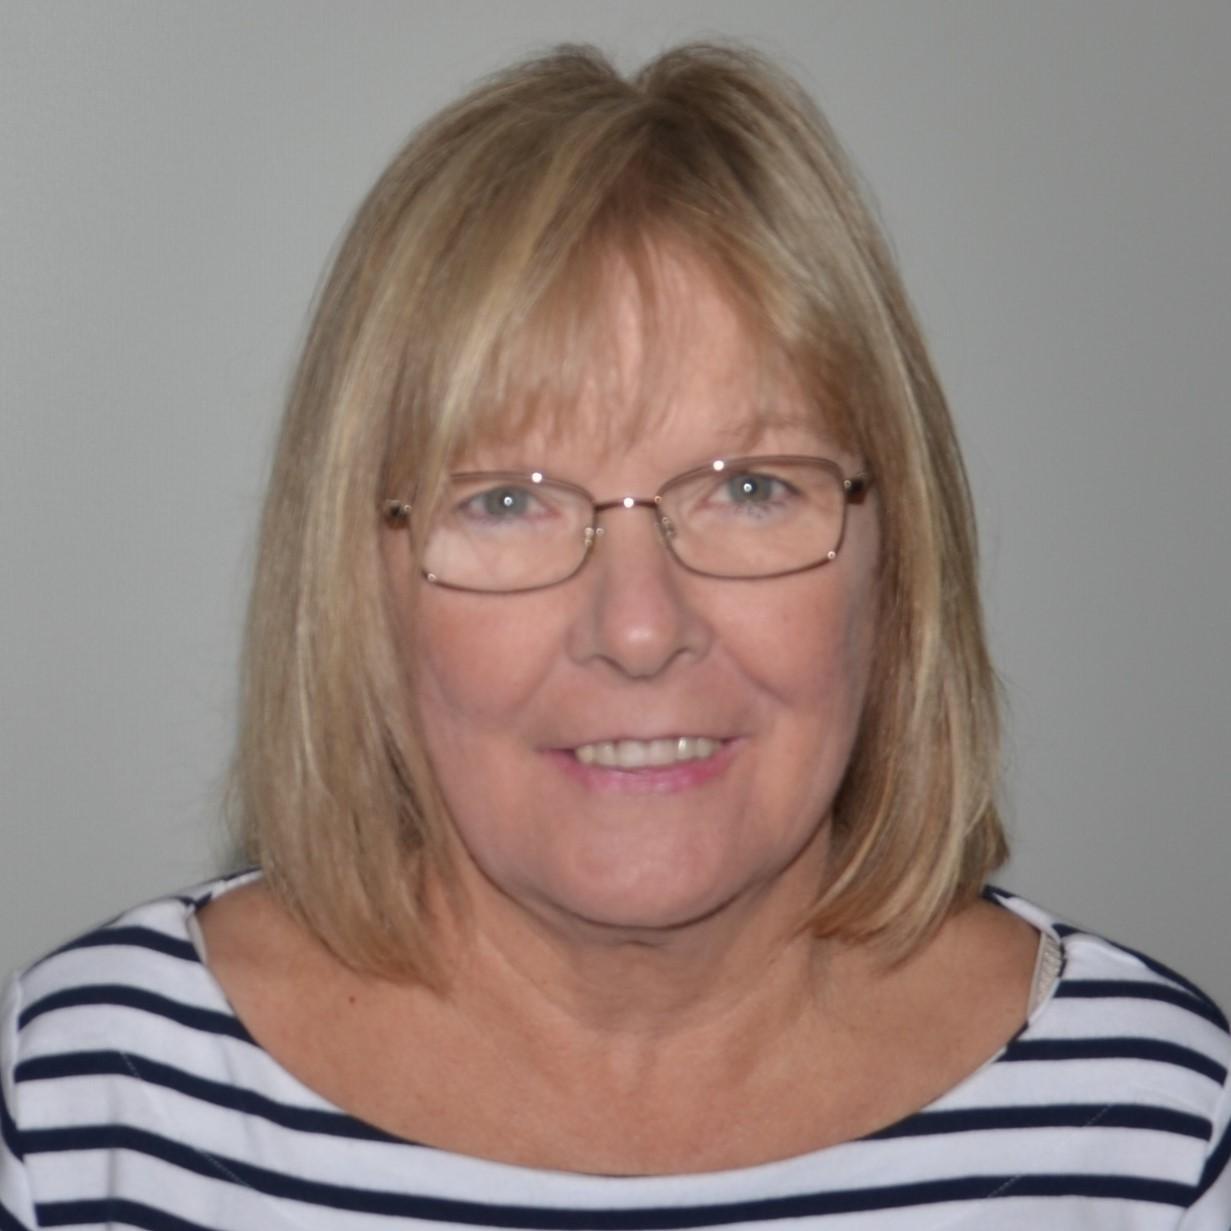 profile picture of edwina parker